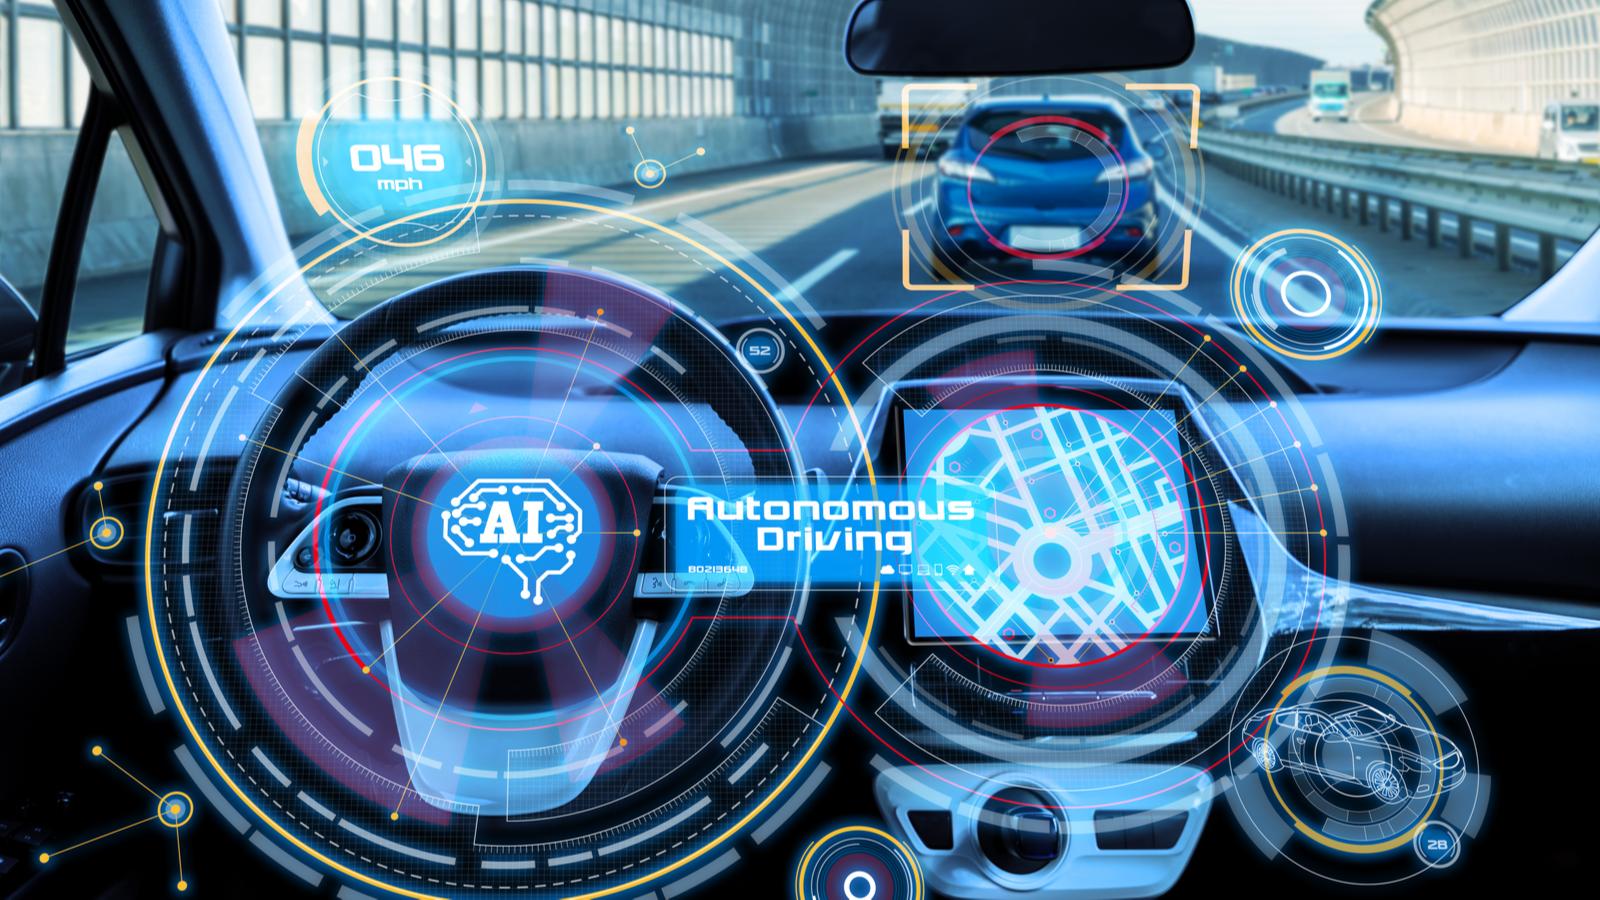 The cockpit of an autonomous car with AI (Artificial Intelligence).